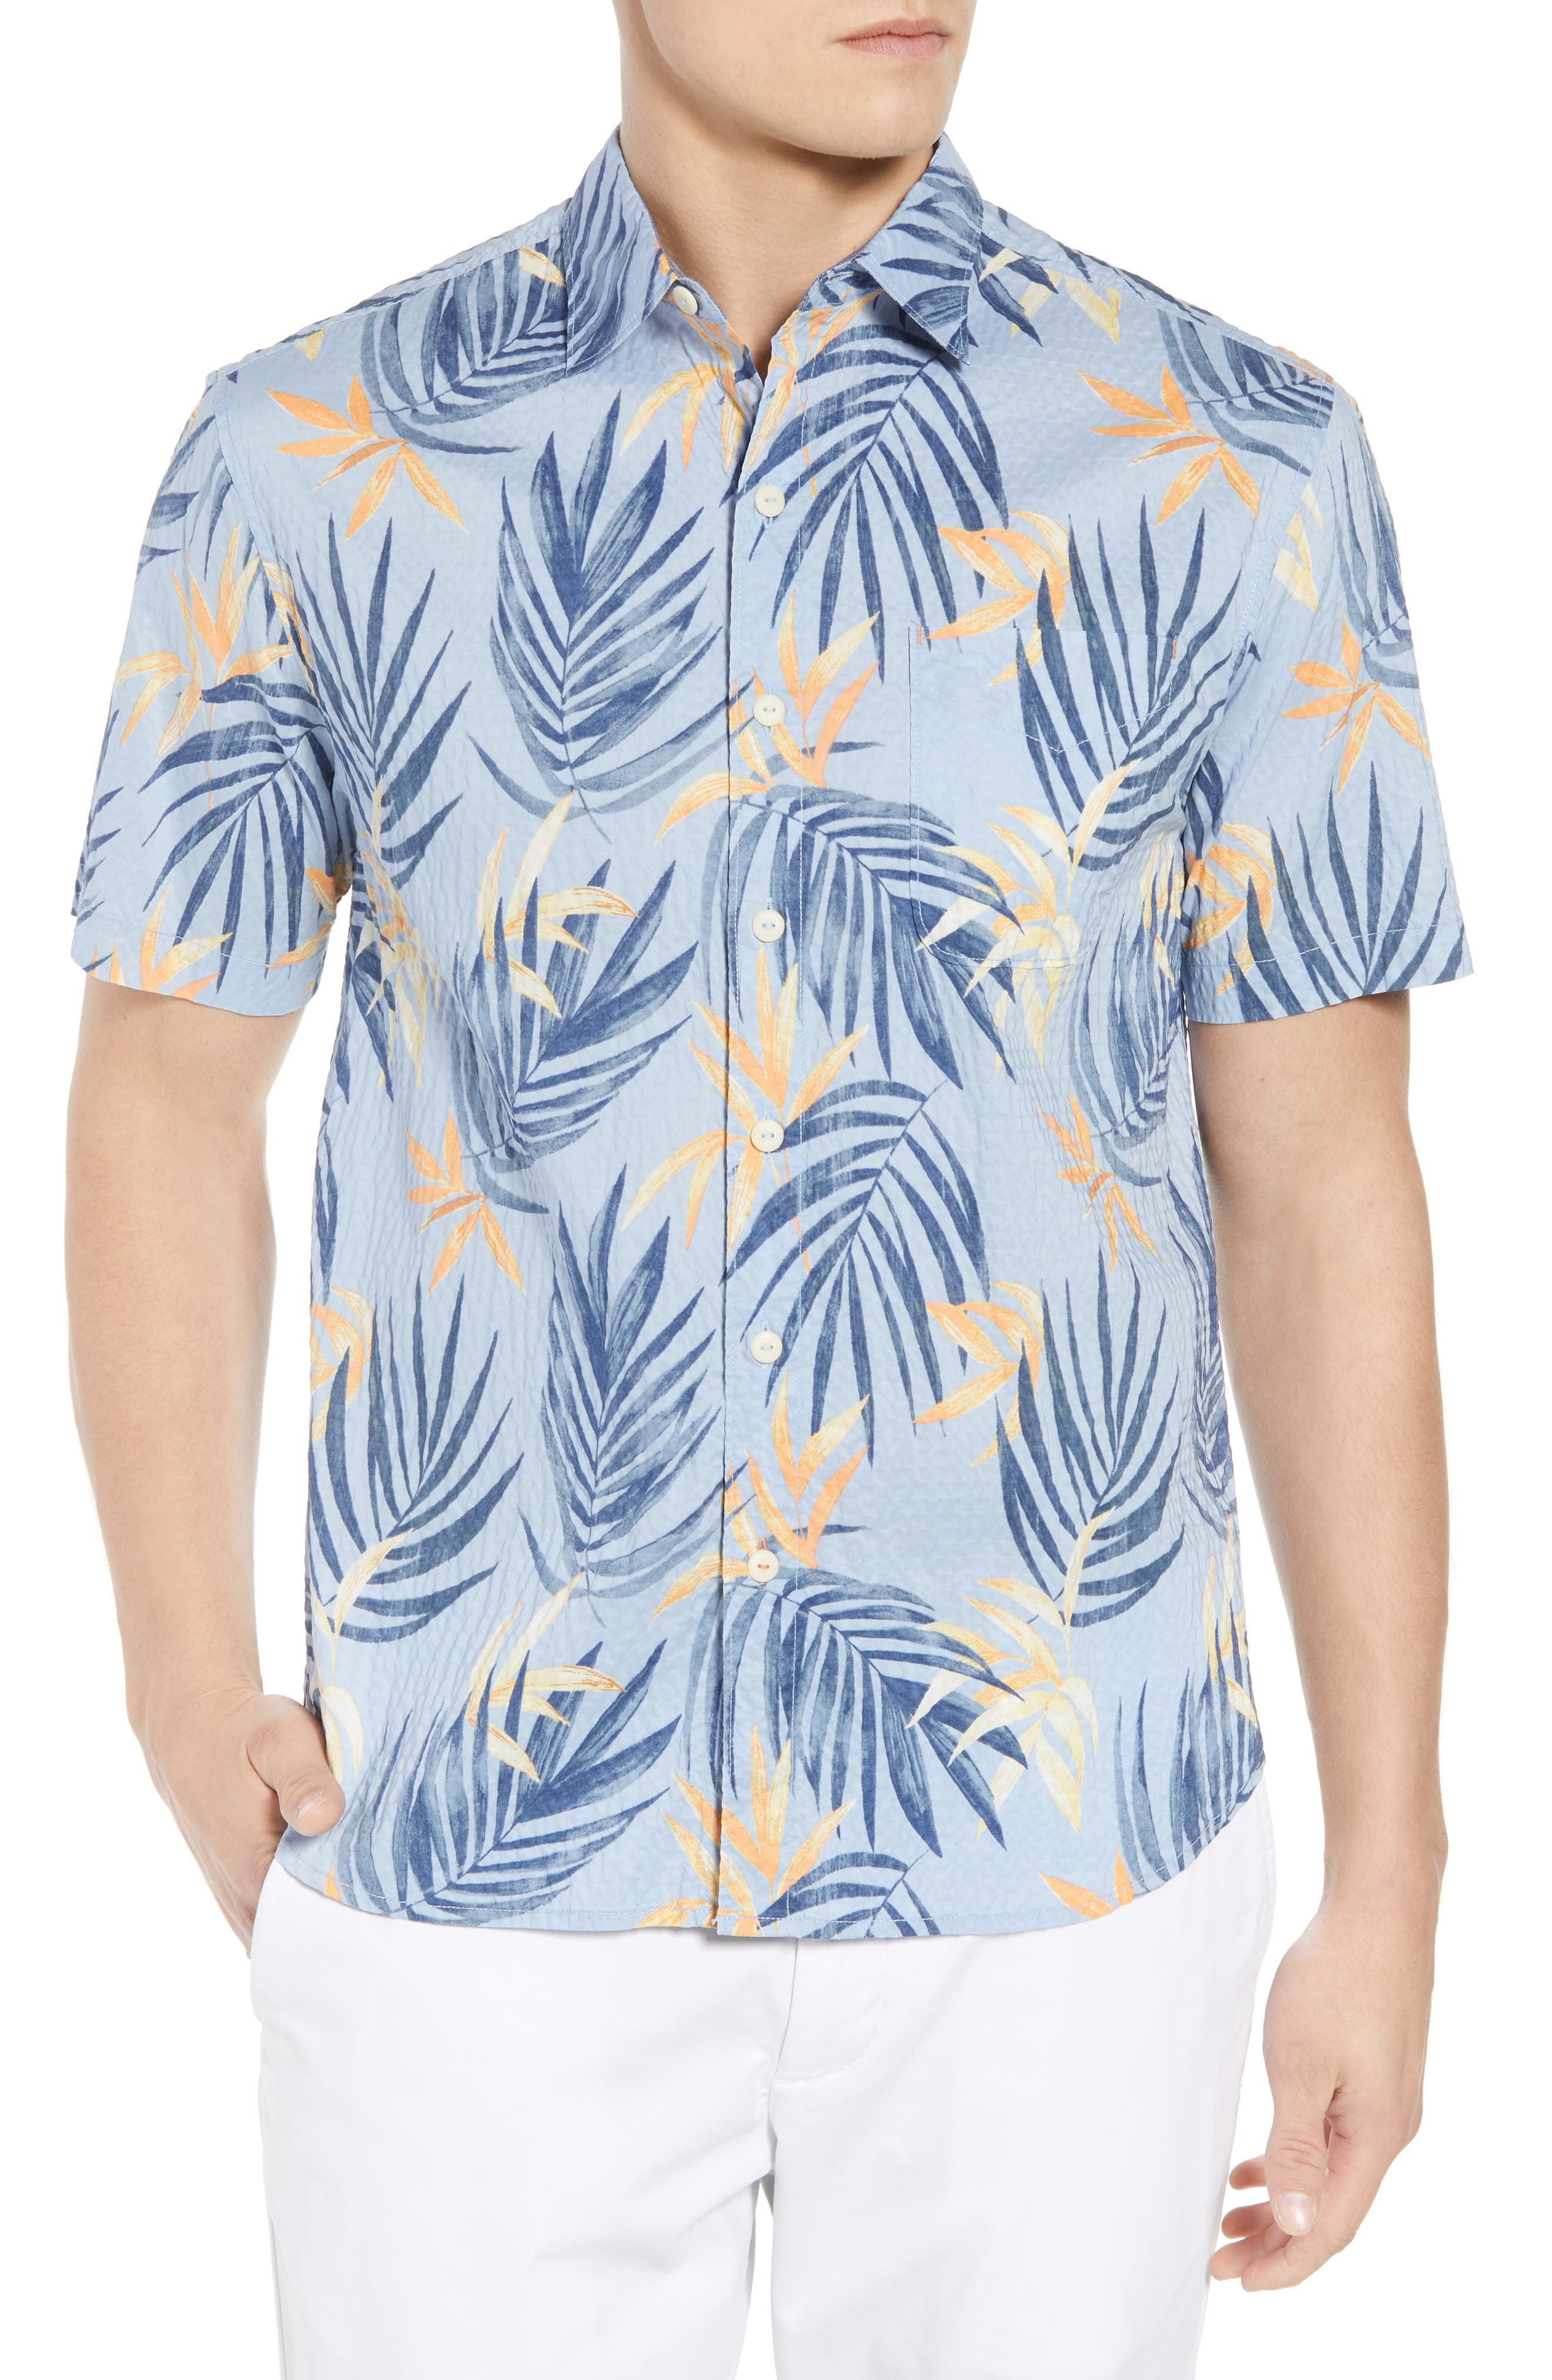 Alternate Image 1 Selected - Tommy Bahama Fiesta Fronds Seersucker Sport Shirt